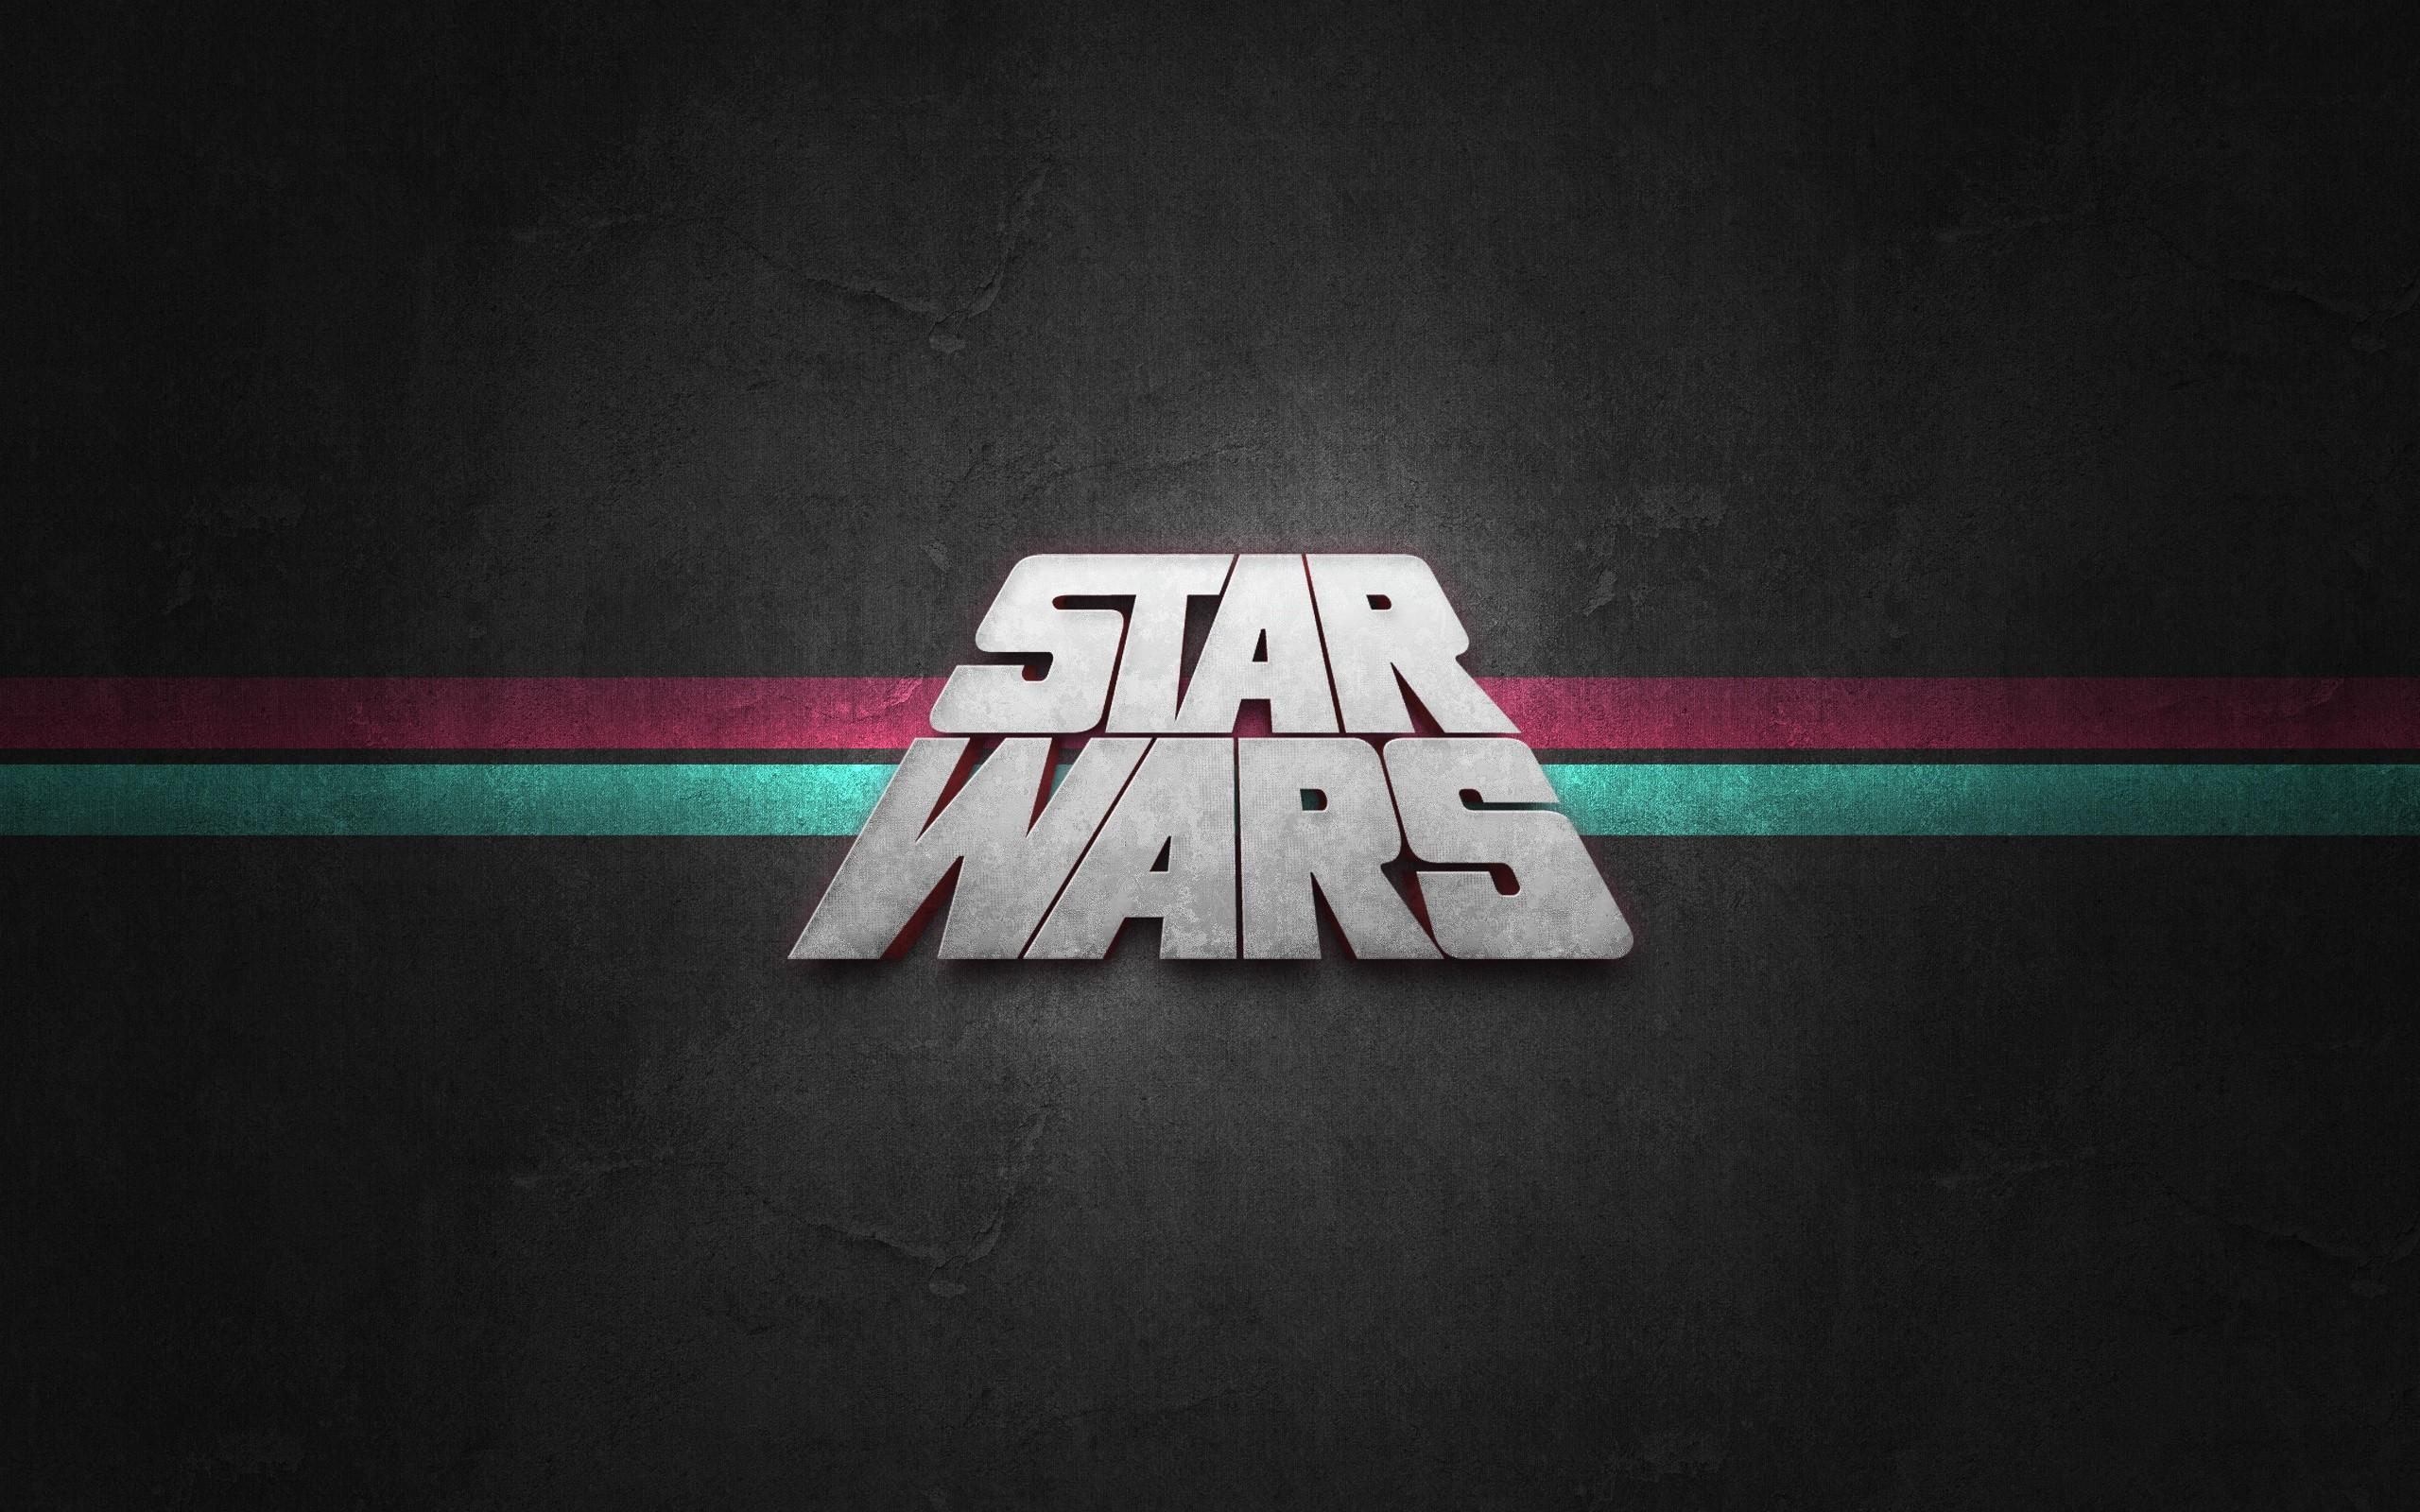 72 Star Wars Desktop Backgrounds Download Free Stunning Hd